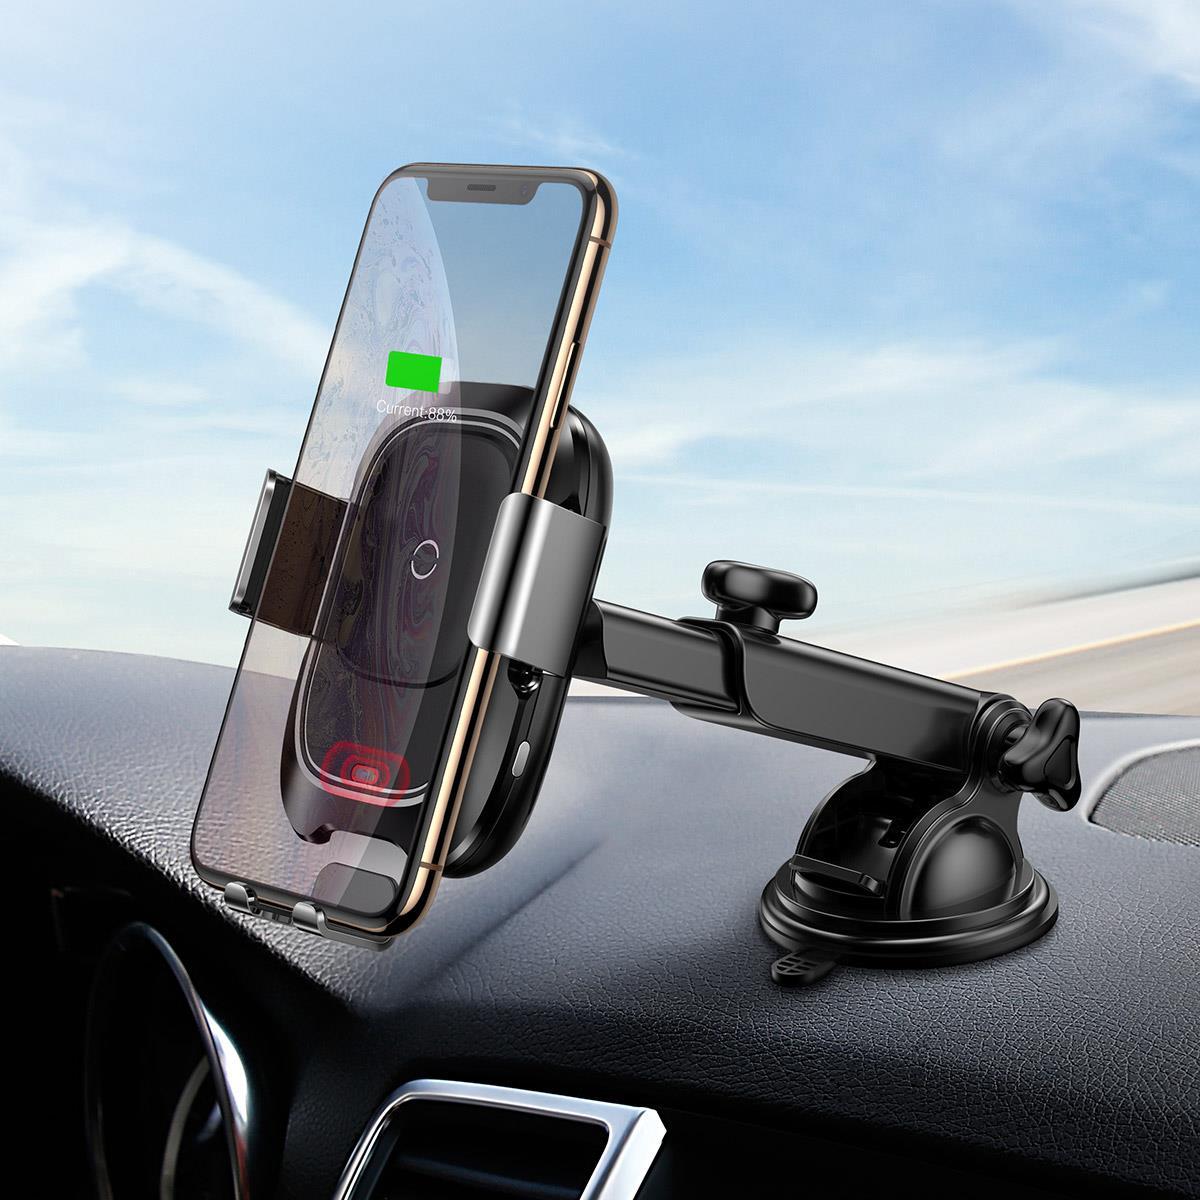 Baseus  Induction charger in a holder with infrared sensor WXZN-B01 Mobilo telefonu turētāji